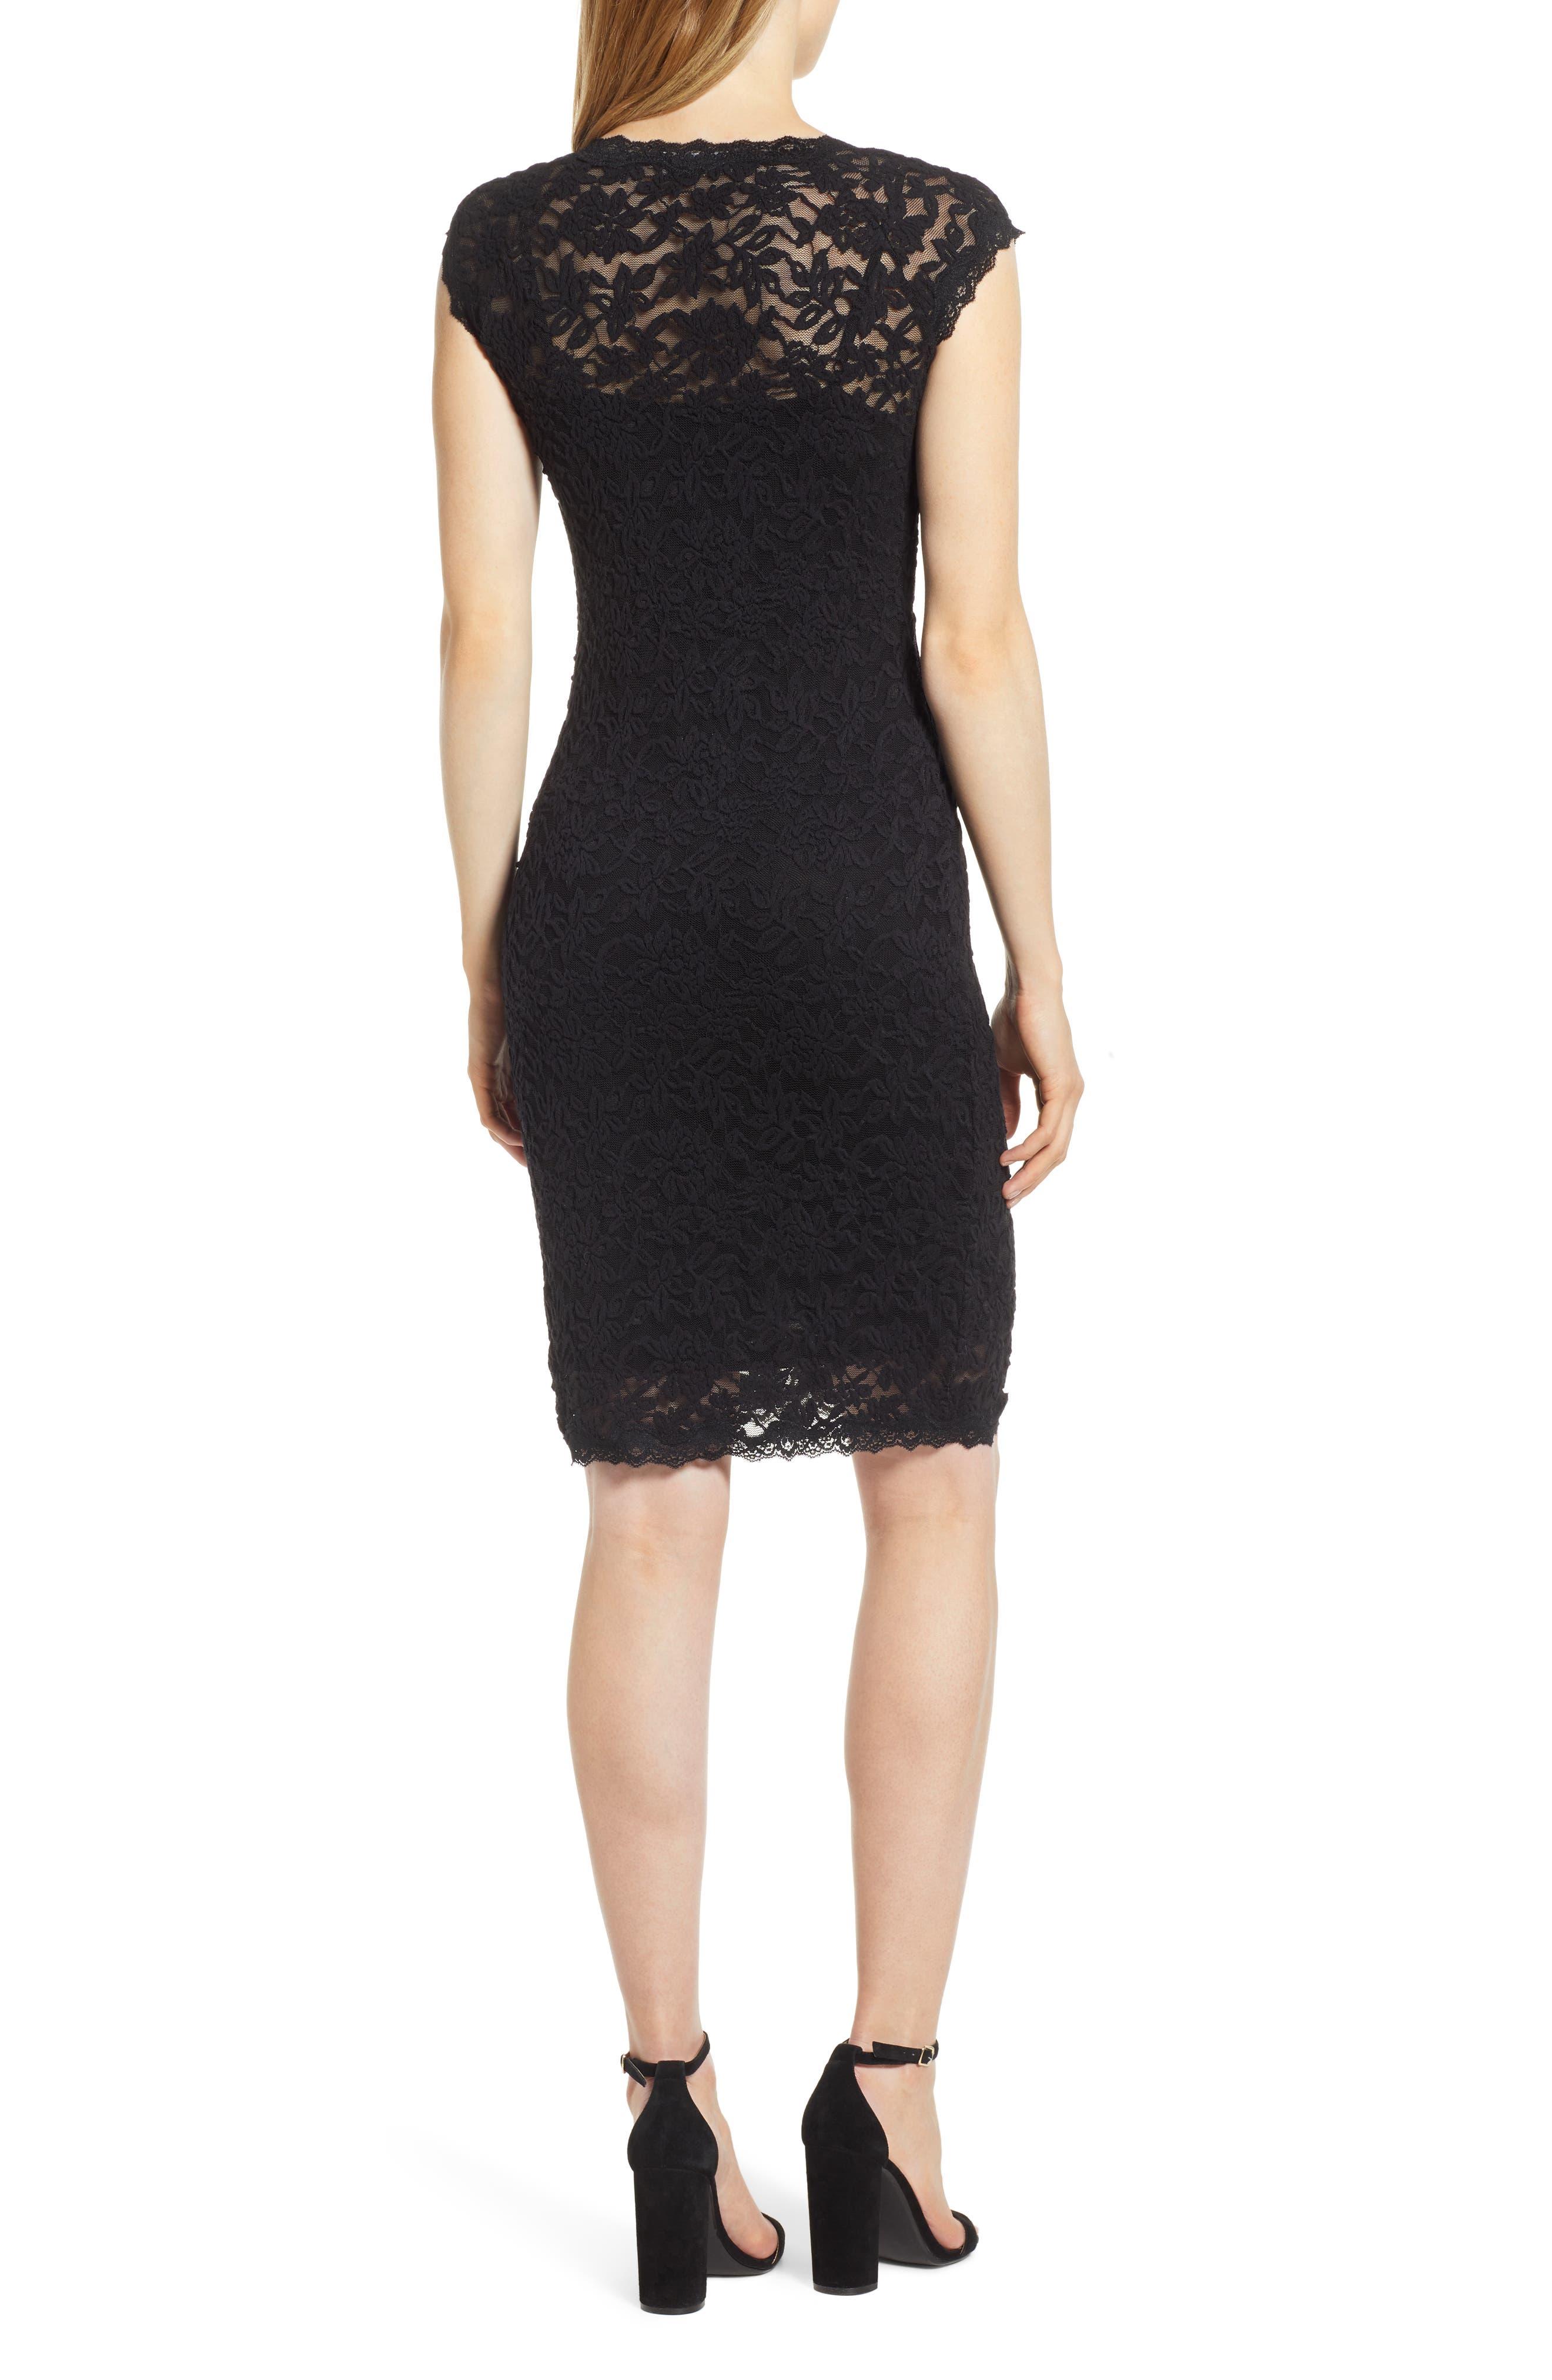 ROSEMUNDE, Delicia V-Neck Dress, Alternate thumbnail 2, color, BLACK